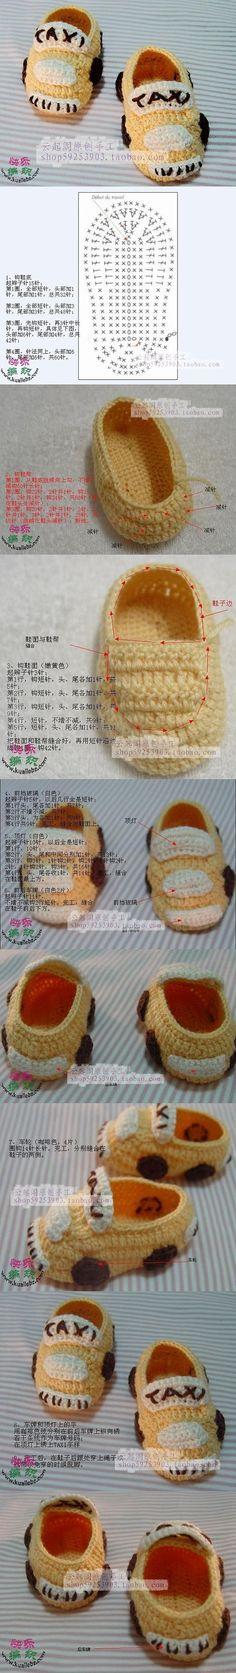 DIY Crochet Shoes